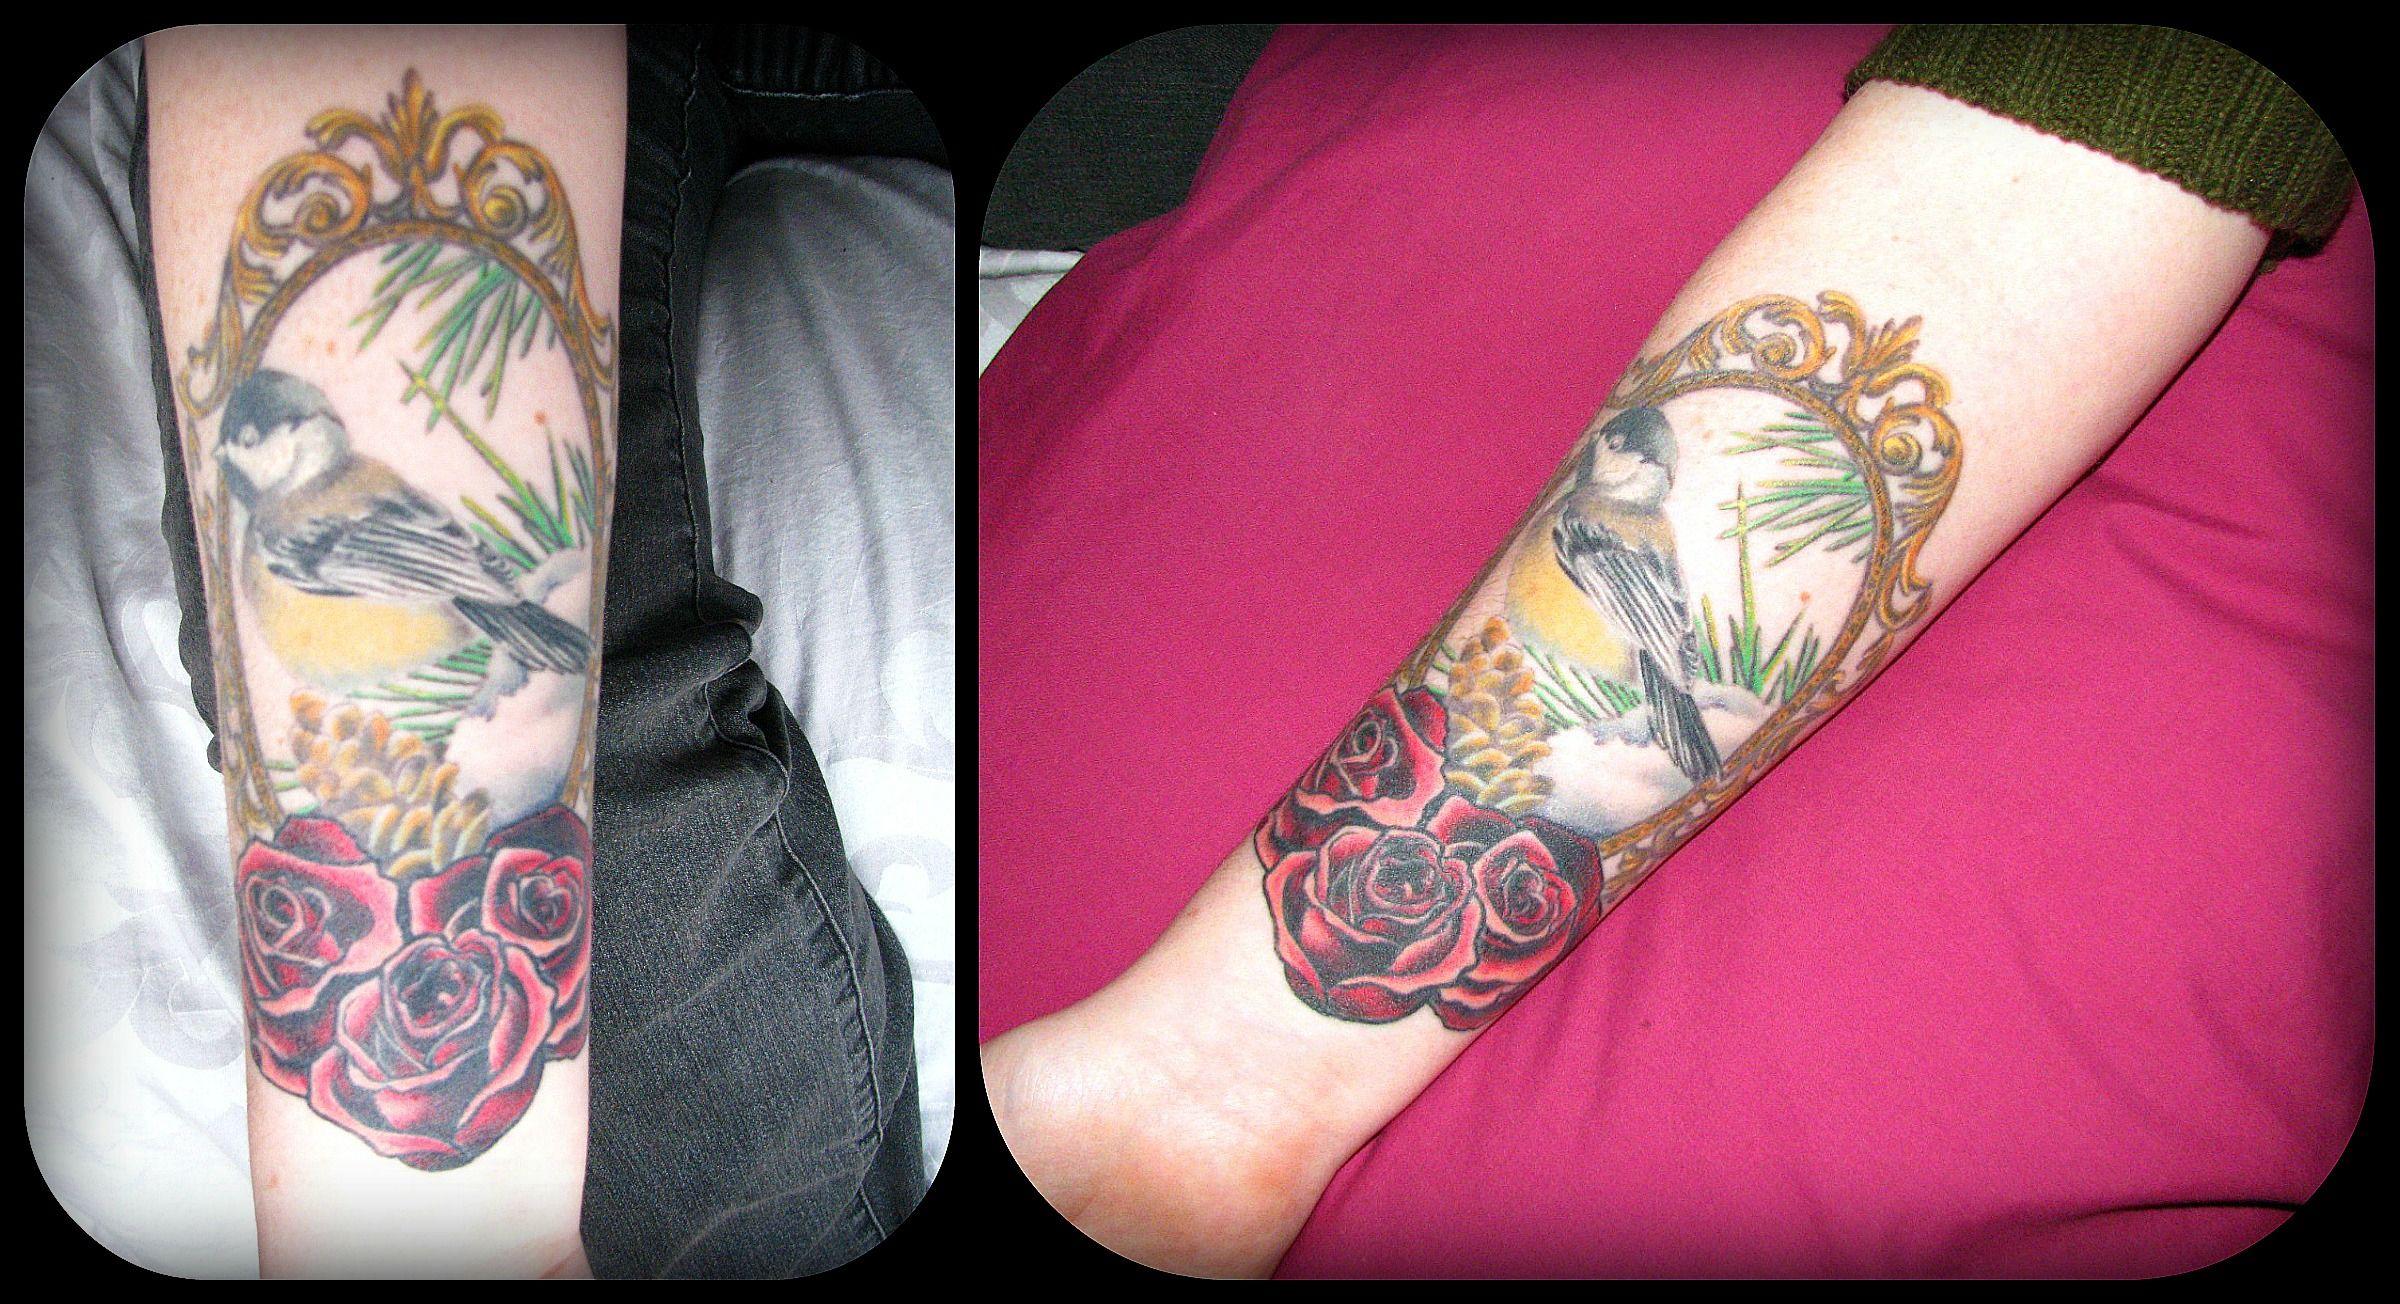 Beautiful Realistic Chickadee Tattoo By Australian Realism: My Framed Chickadee And Roses Tattoo. Forearm Piece